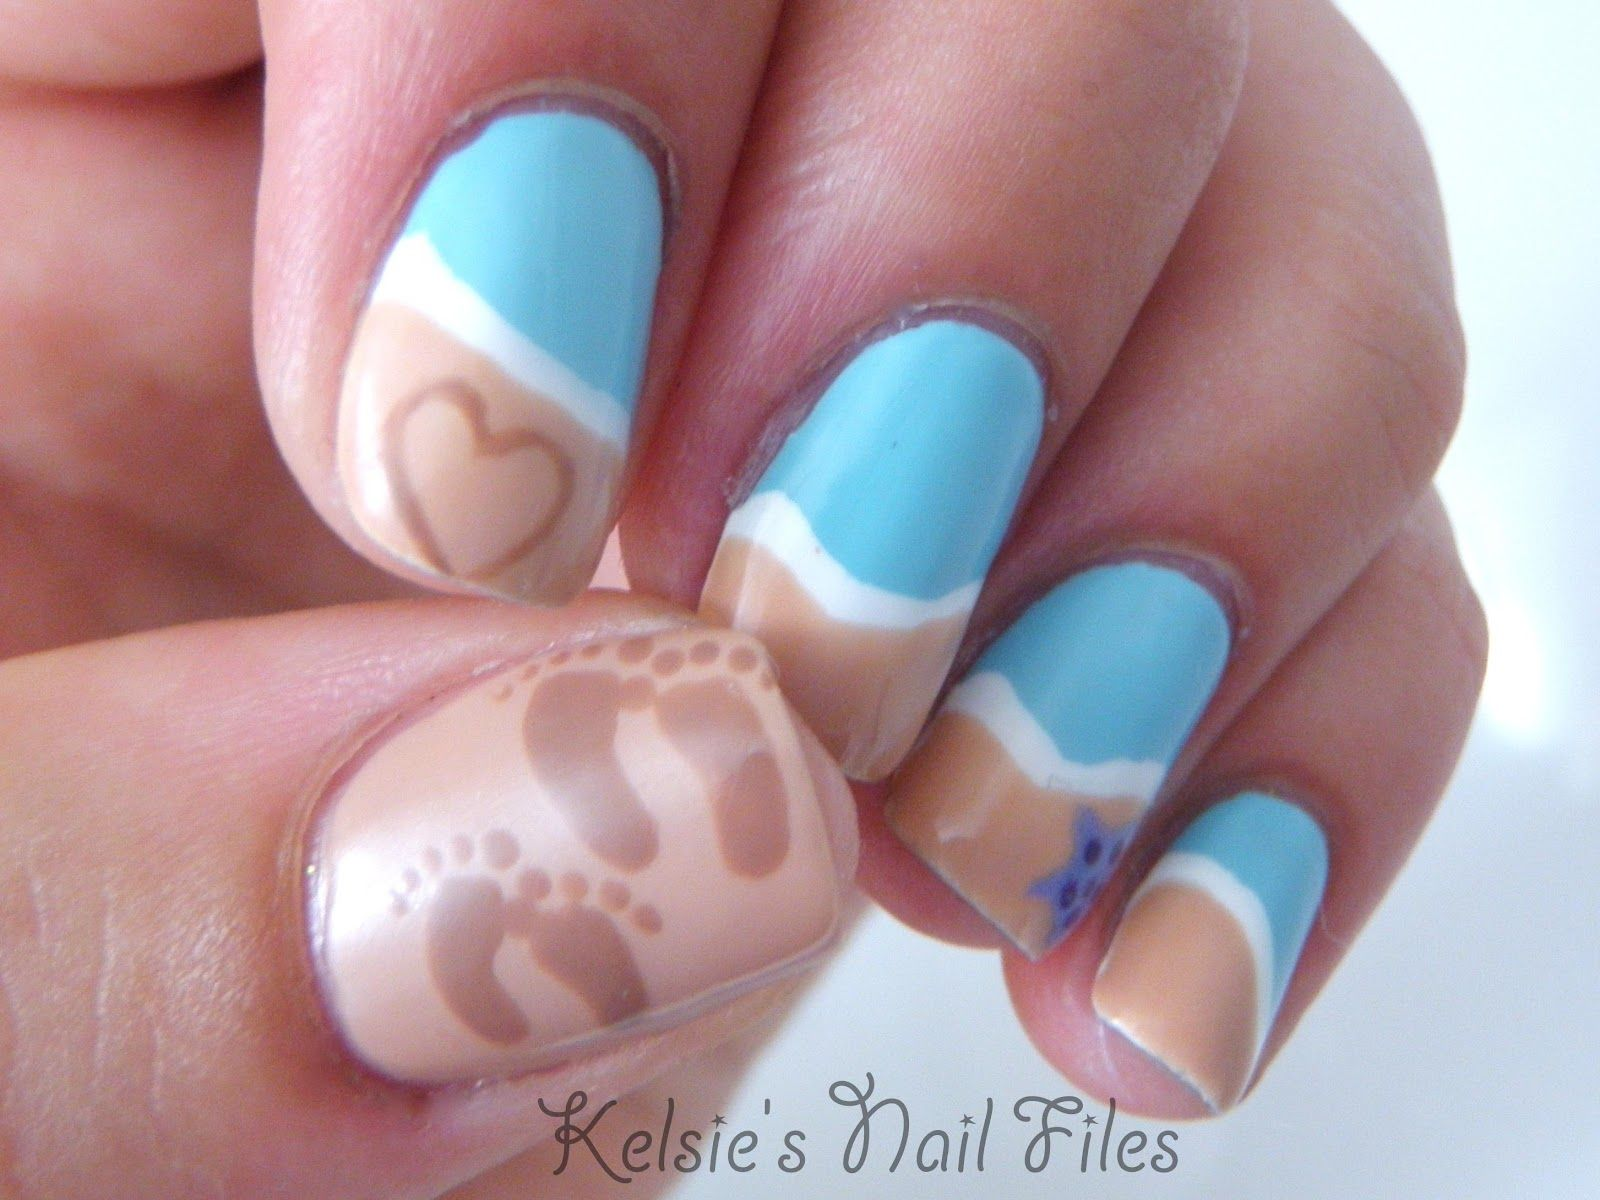 A blog about nail art   Seabrook   Pinterest   Fun challenges ...